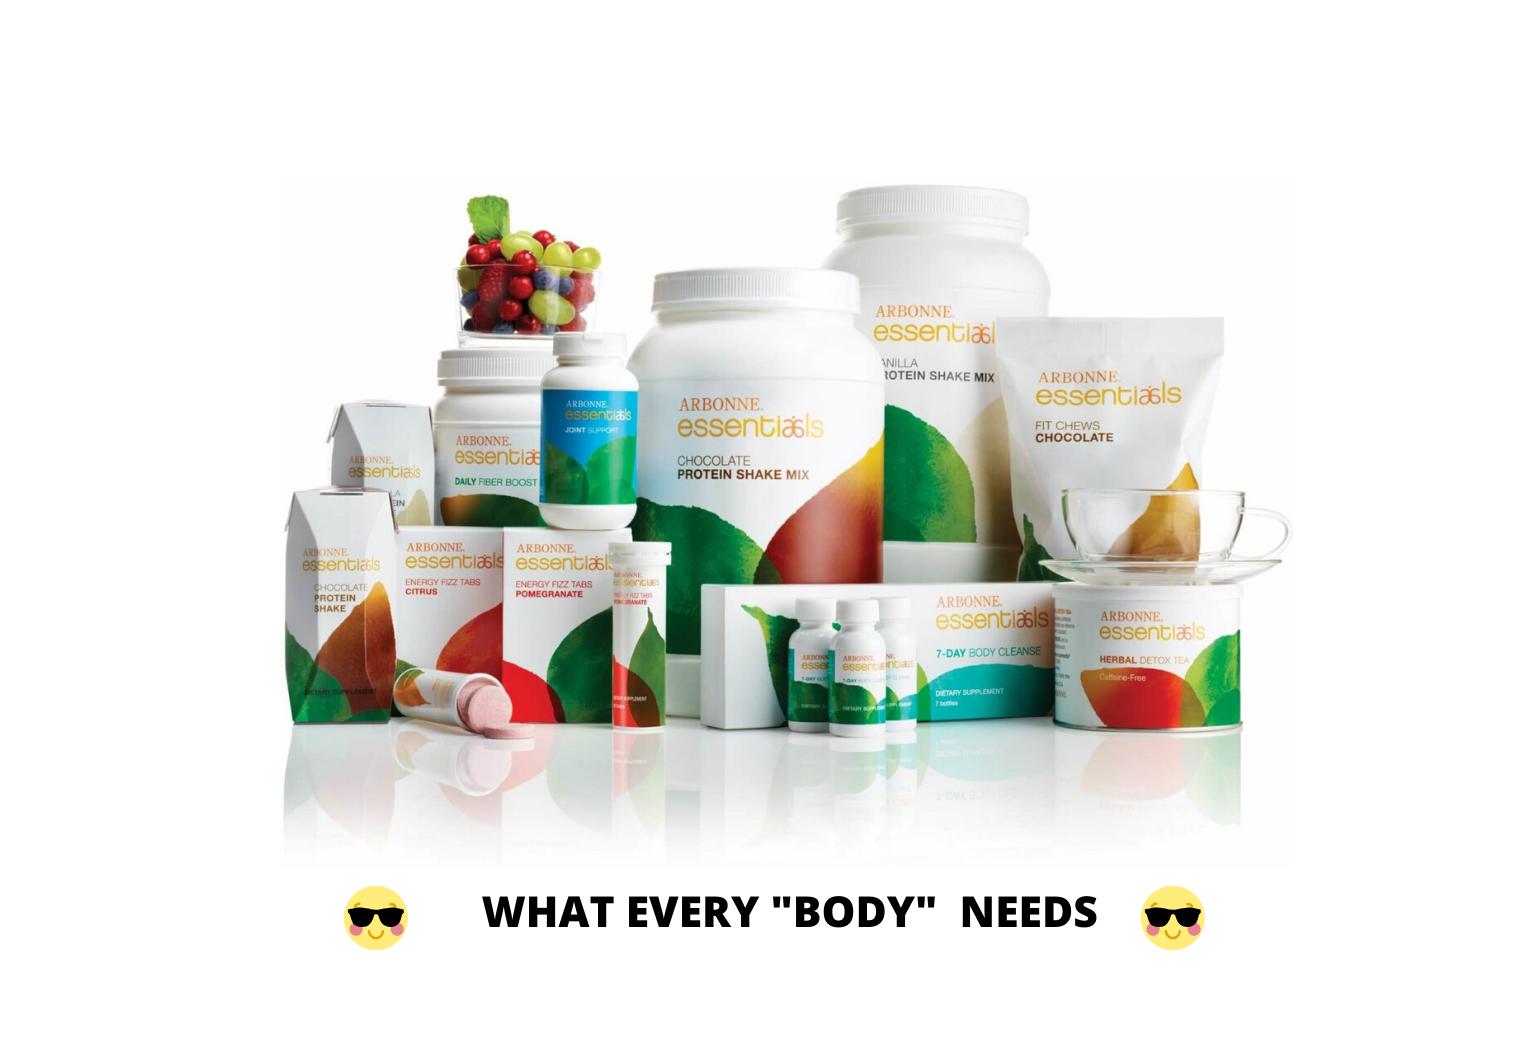 Best Arbonne Nutrition Products